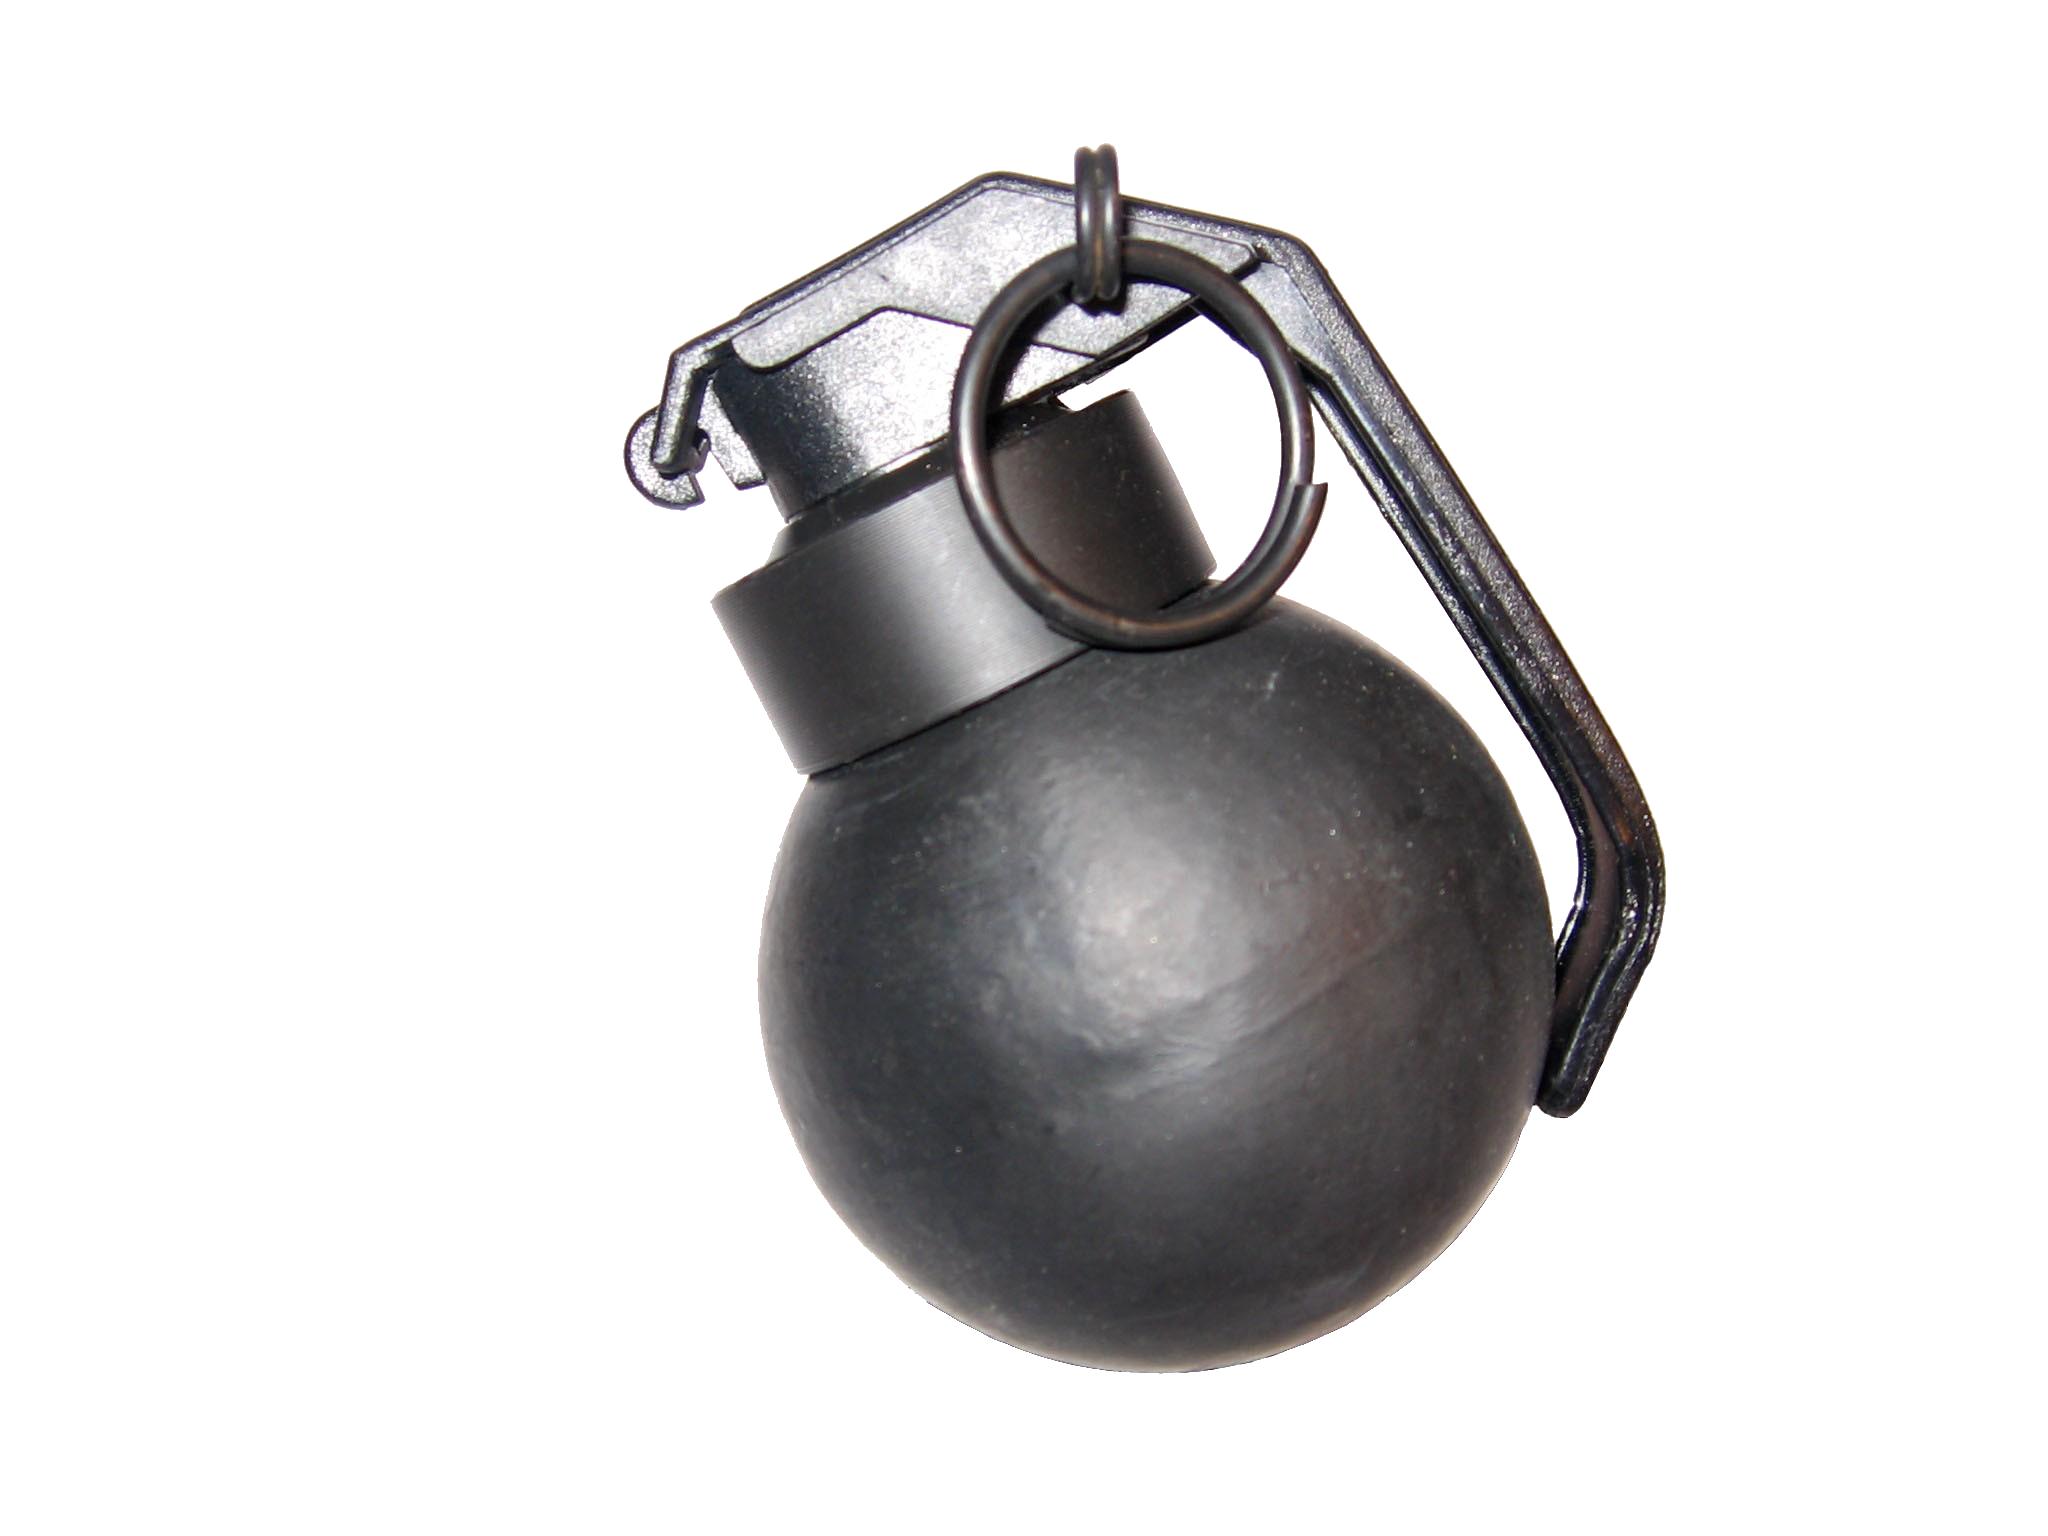 Hand Grenade Png Image - Grenade, Transparent background PNG HD thumbnail